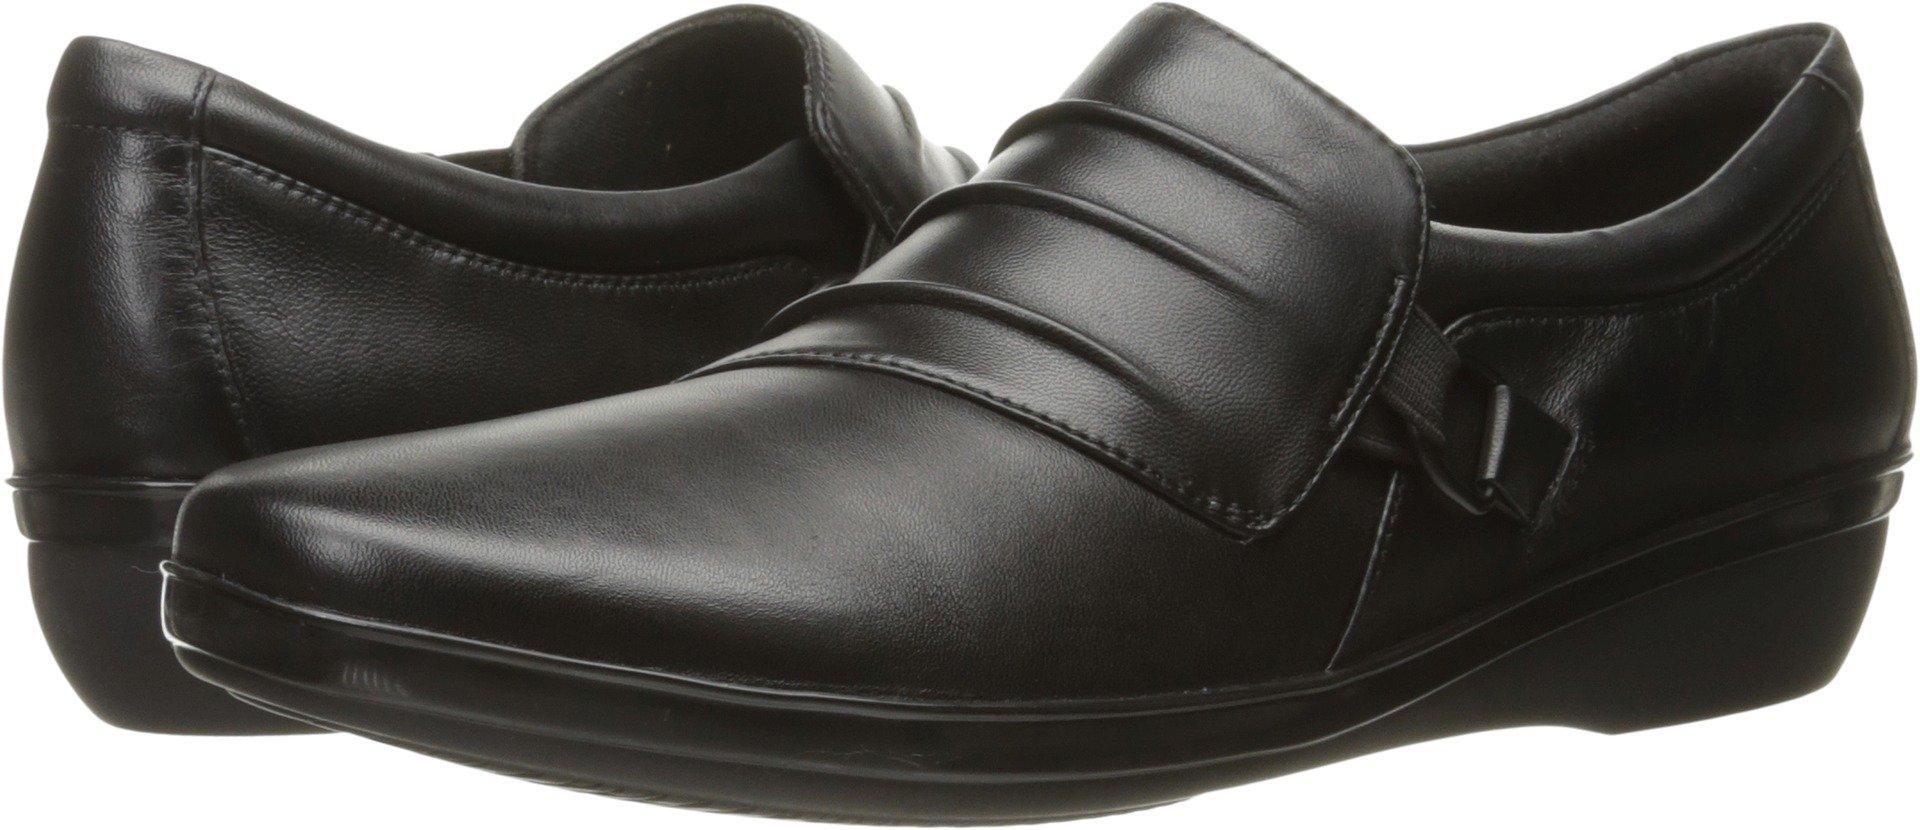 CLARKS Women's Everlay Heidi Slip-on Loafer, Black Leather, 8.5 W US